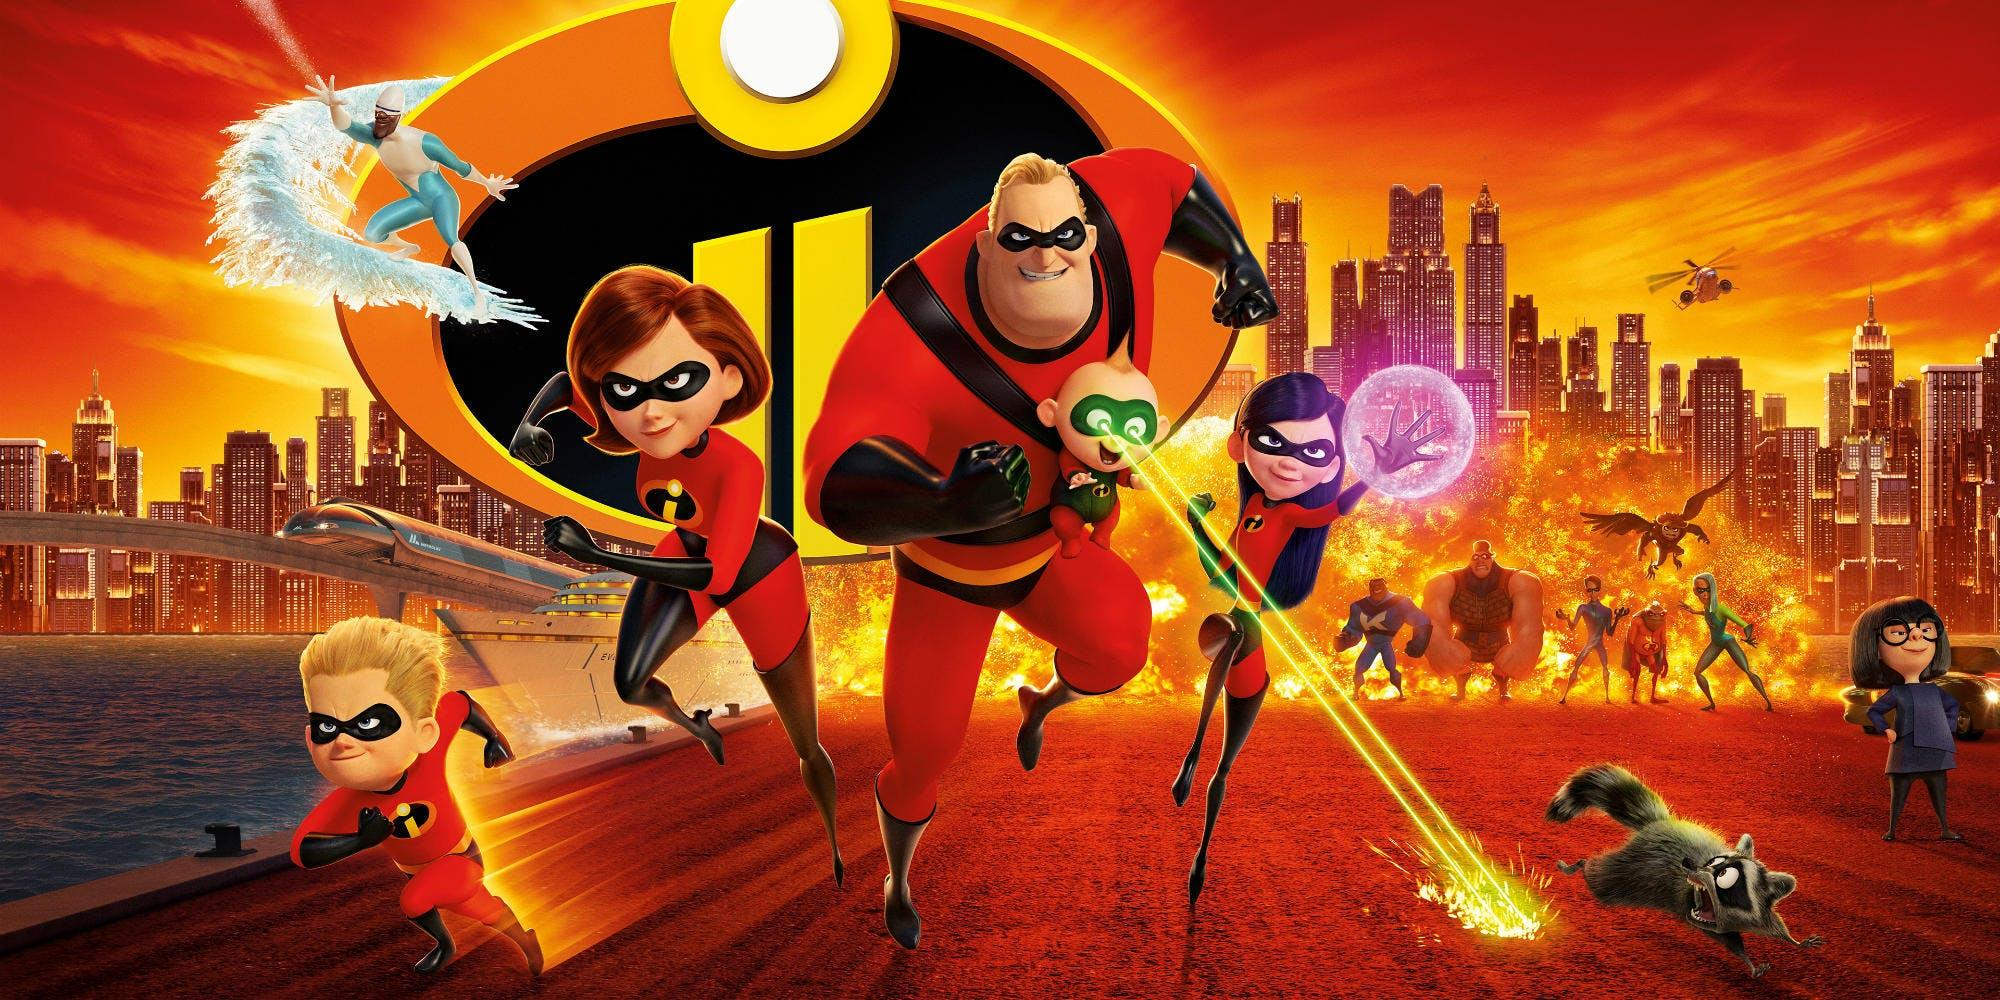 Oscar Nominated Movies - Incredibles 2